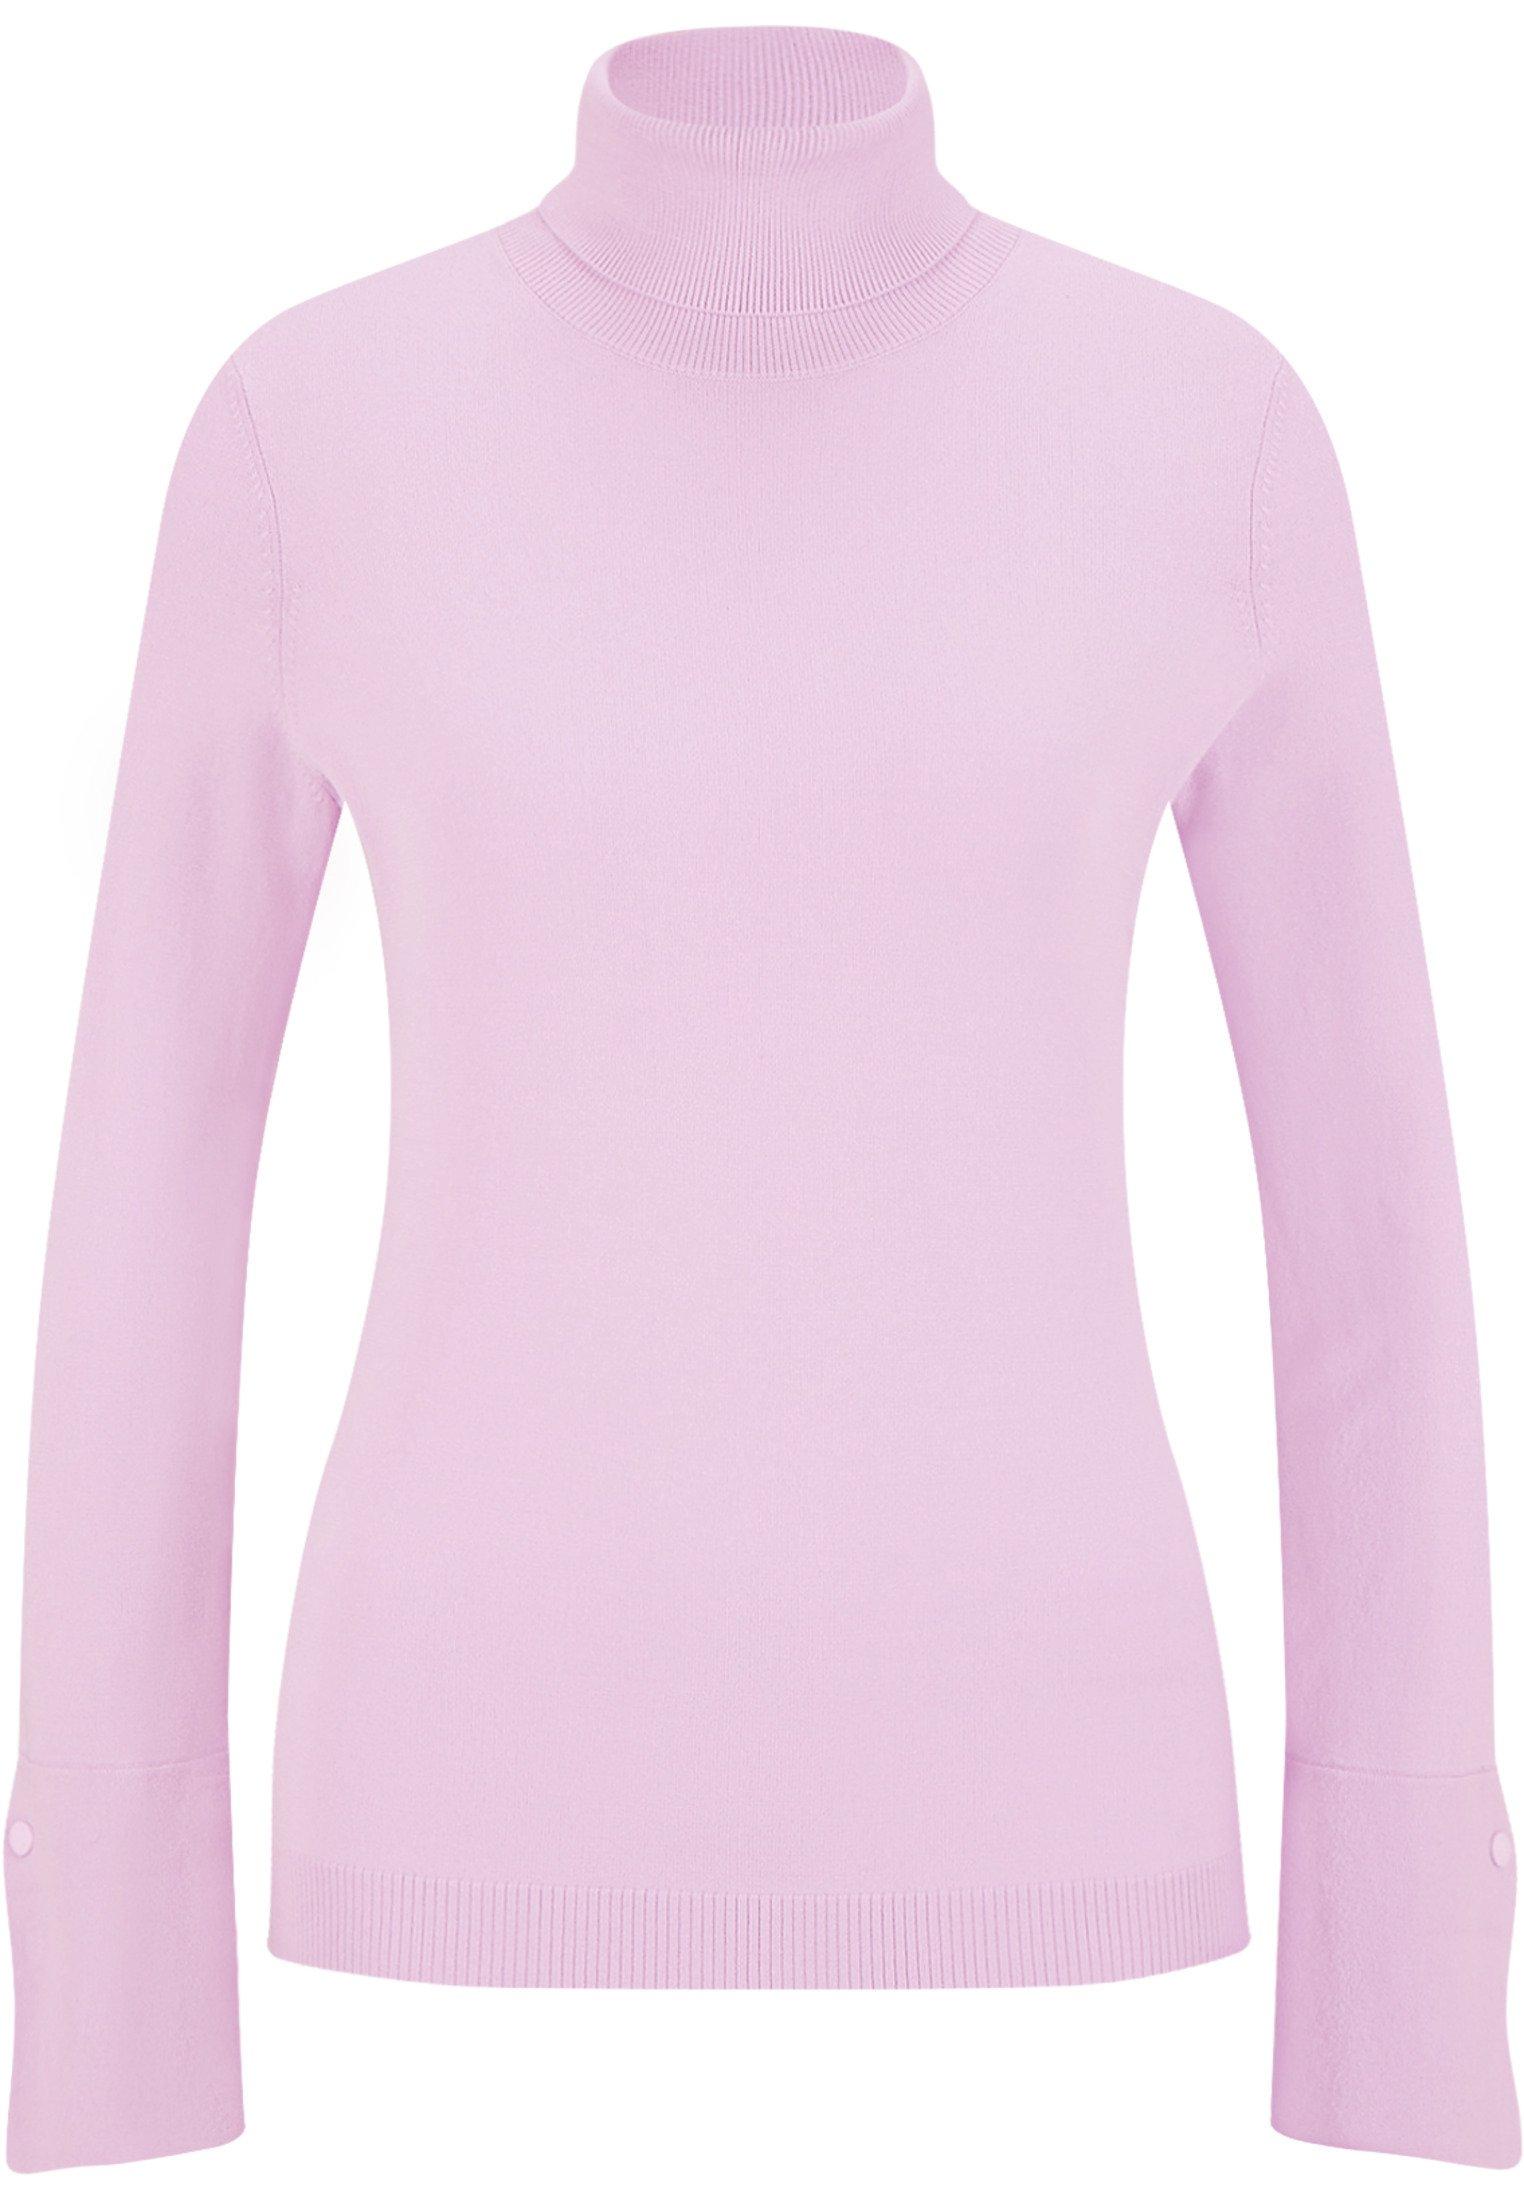 Femme VINNY - Pullover